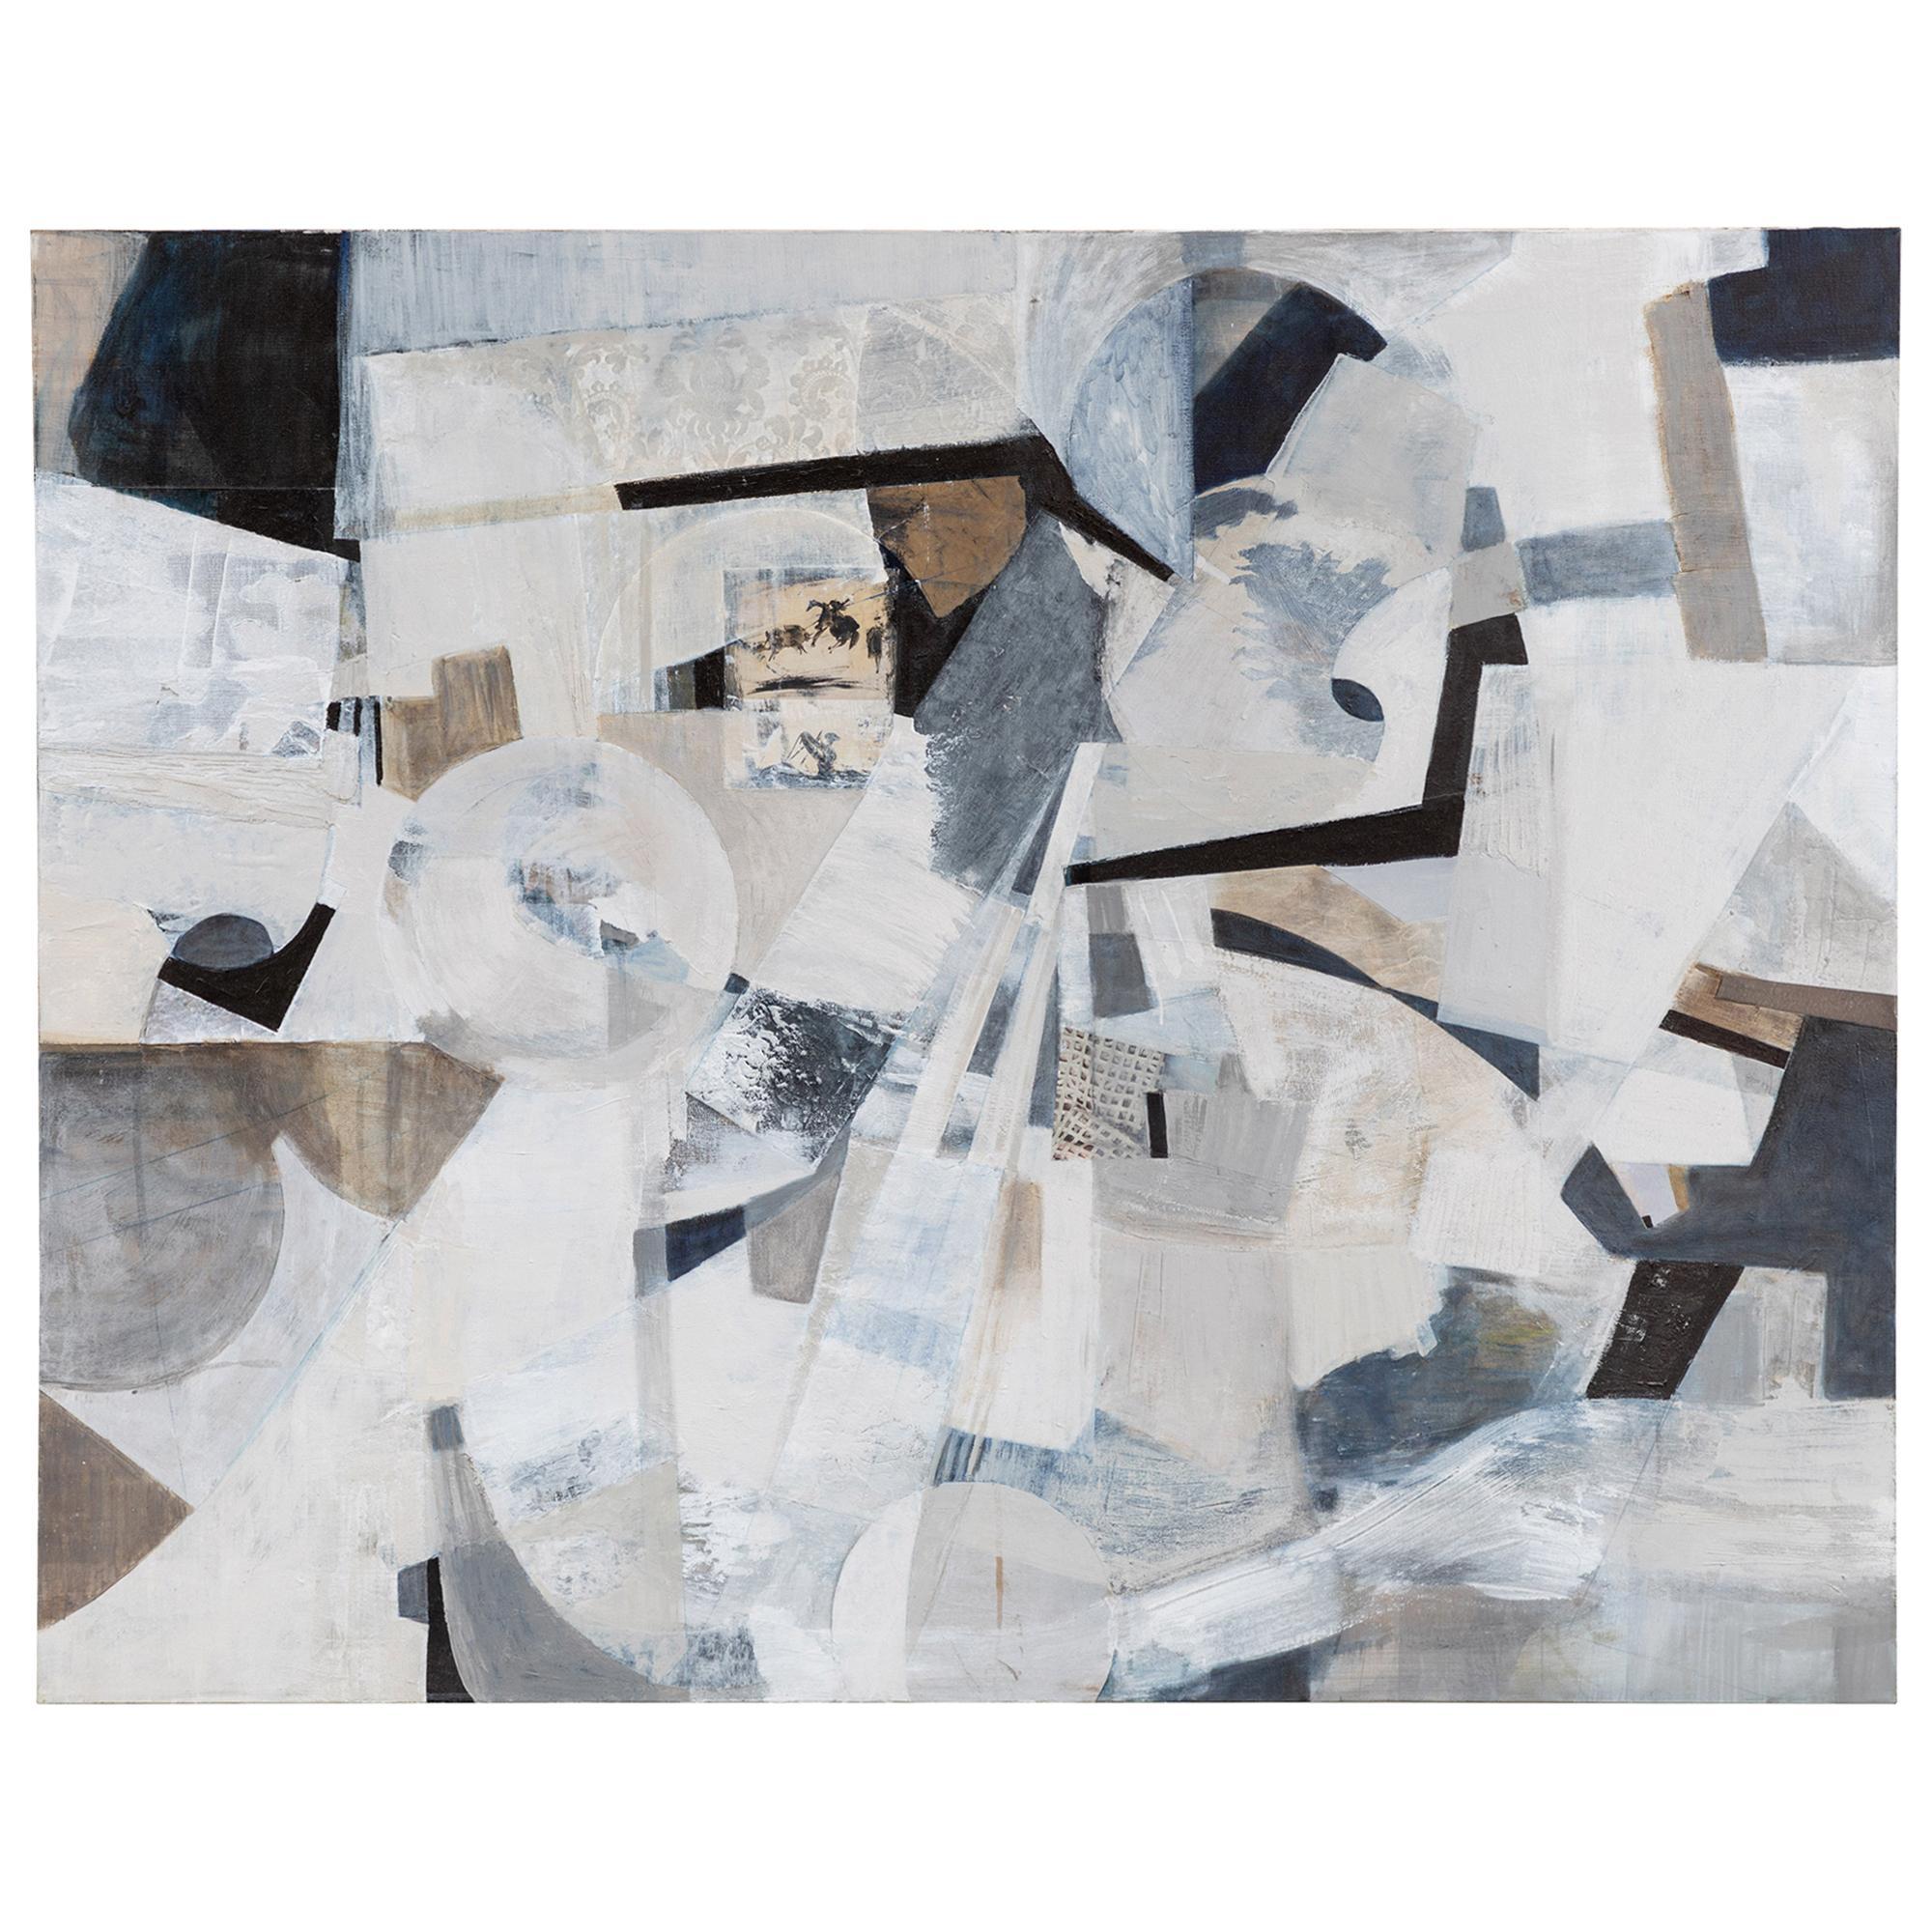 Abstract Painting by Kari Kroll